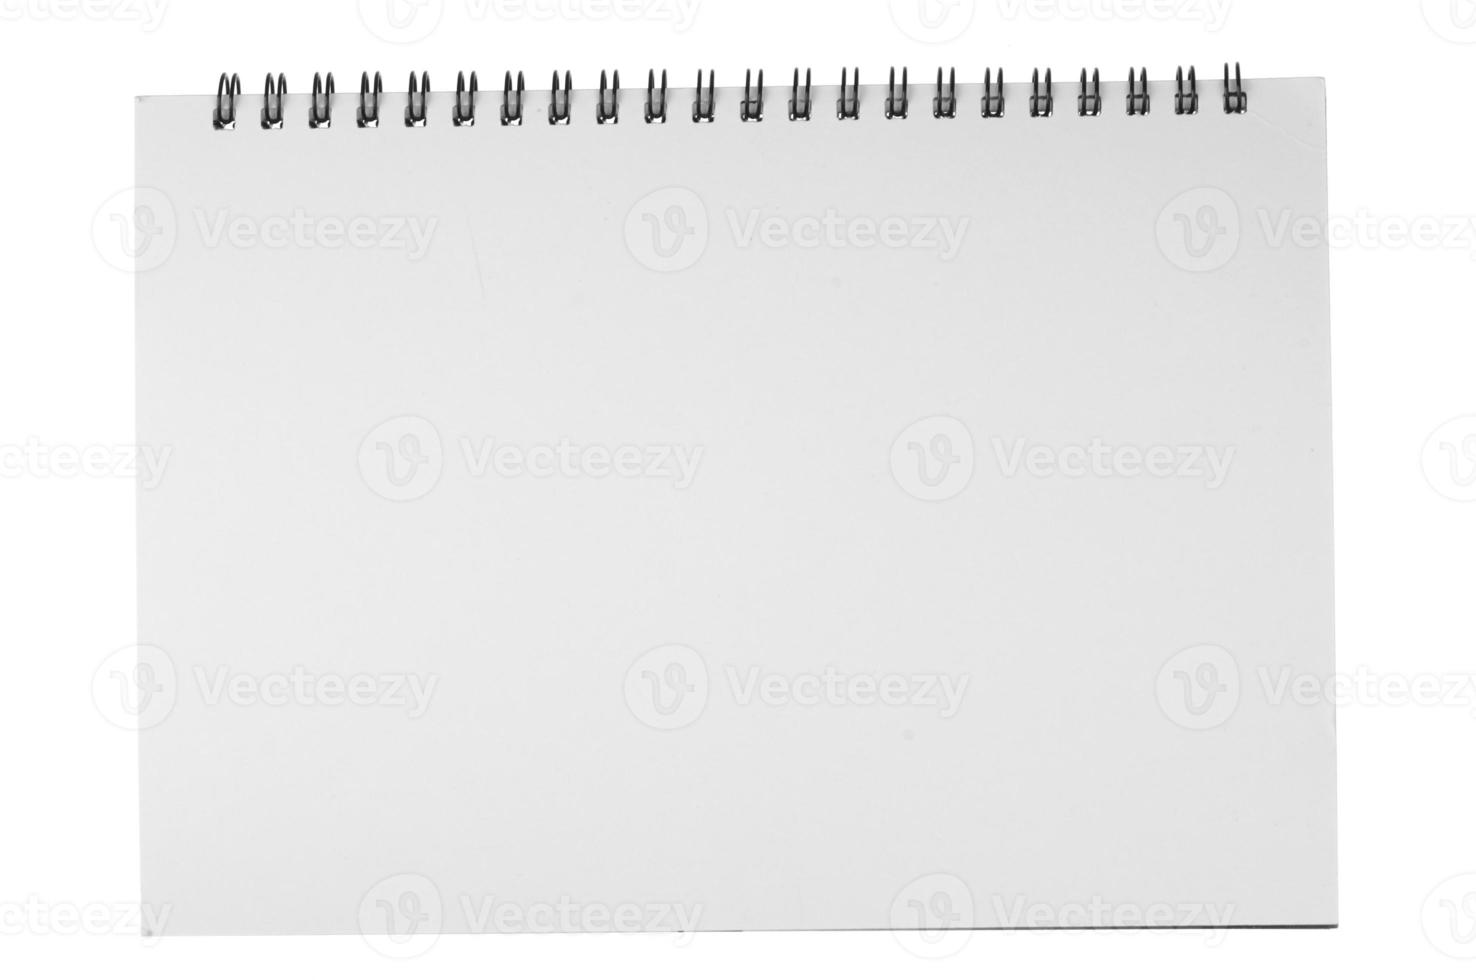 leeres Notizbuch öffnen foto